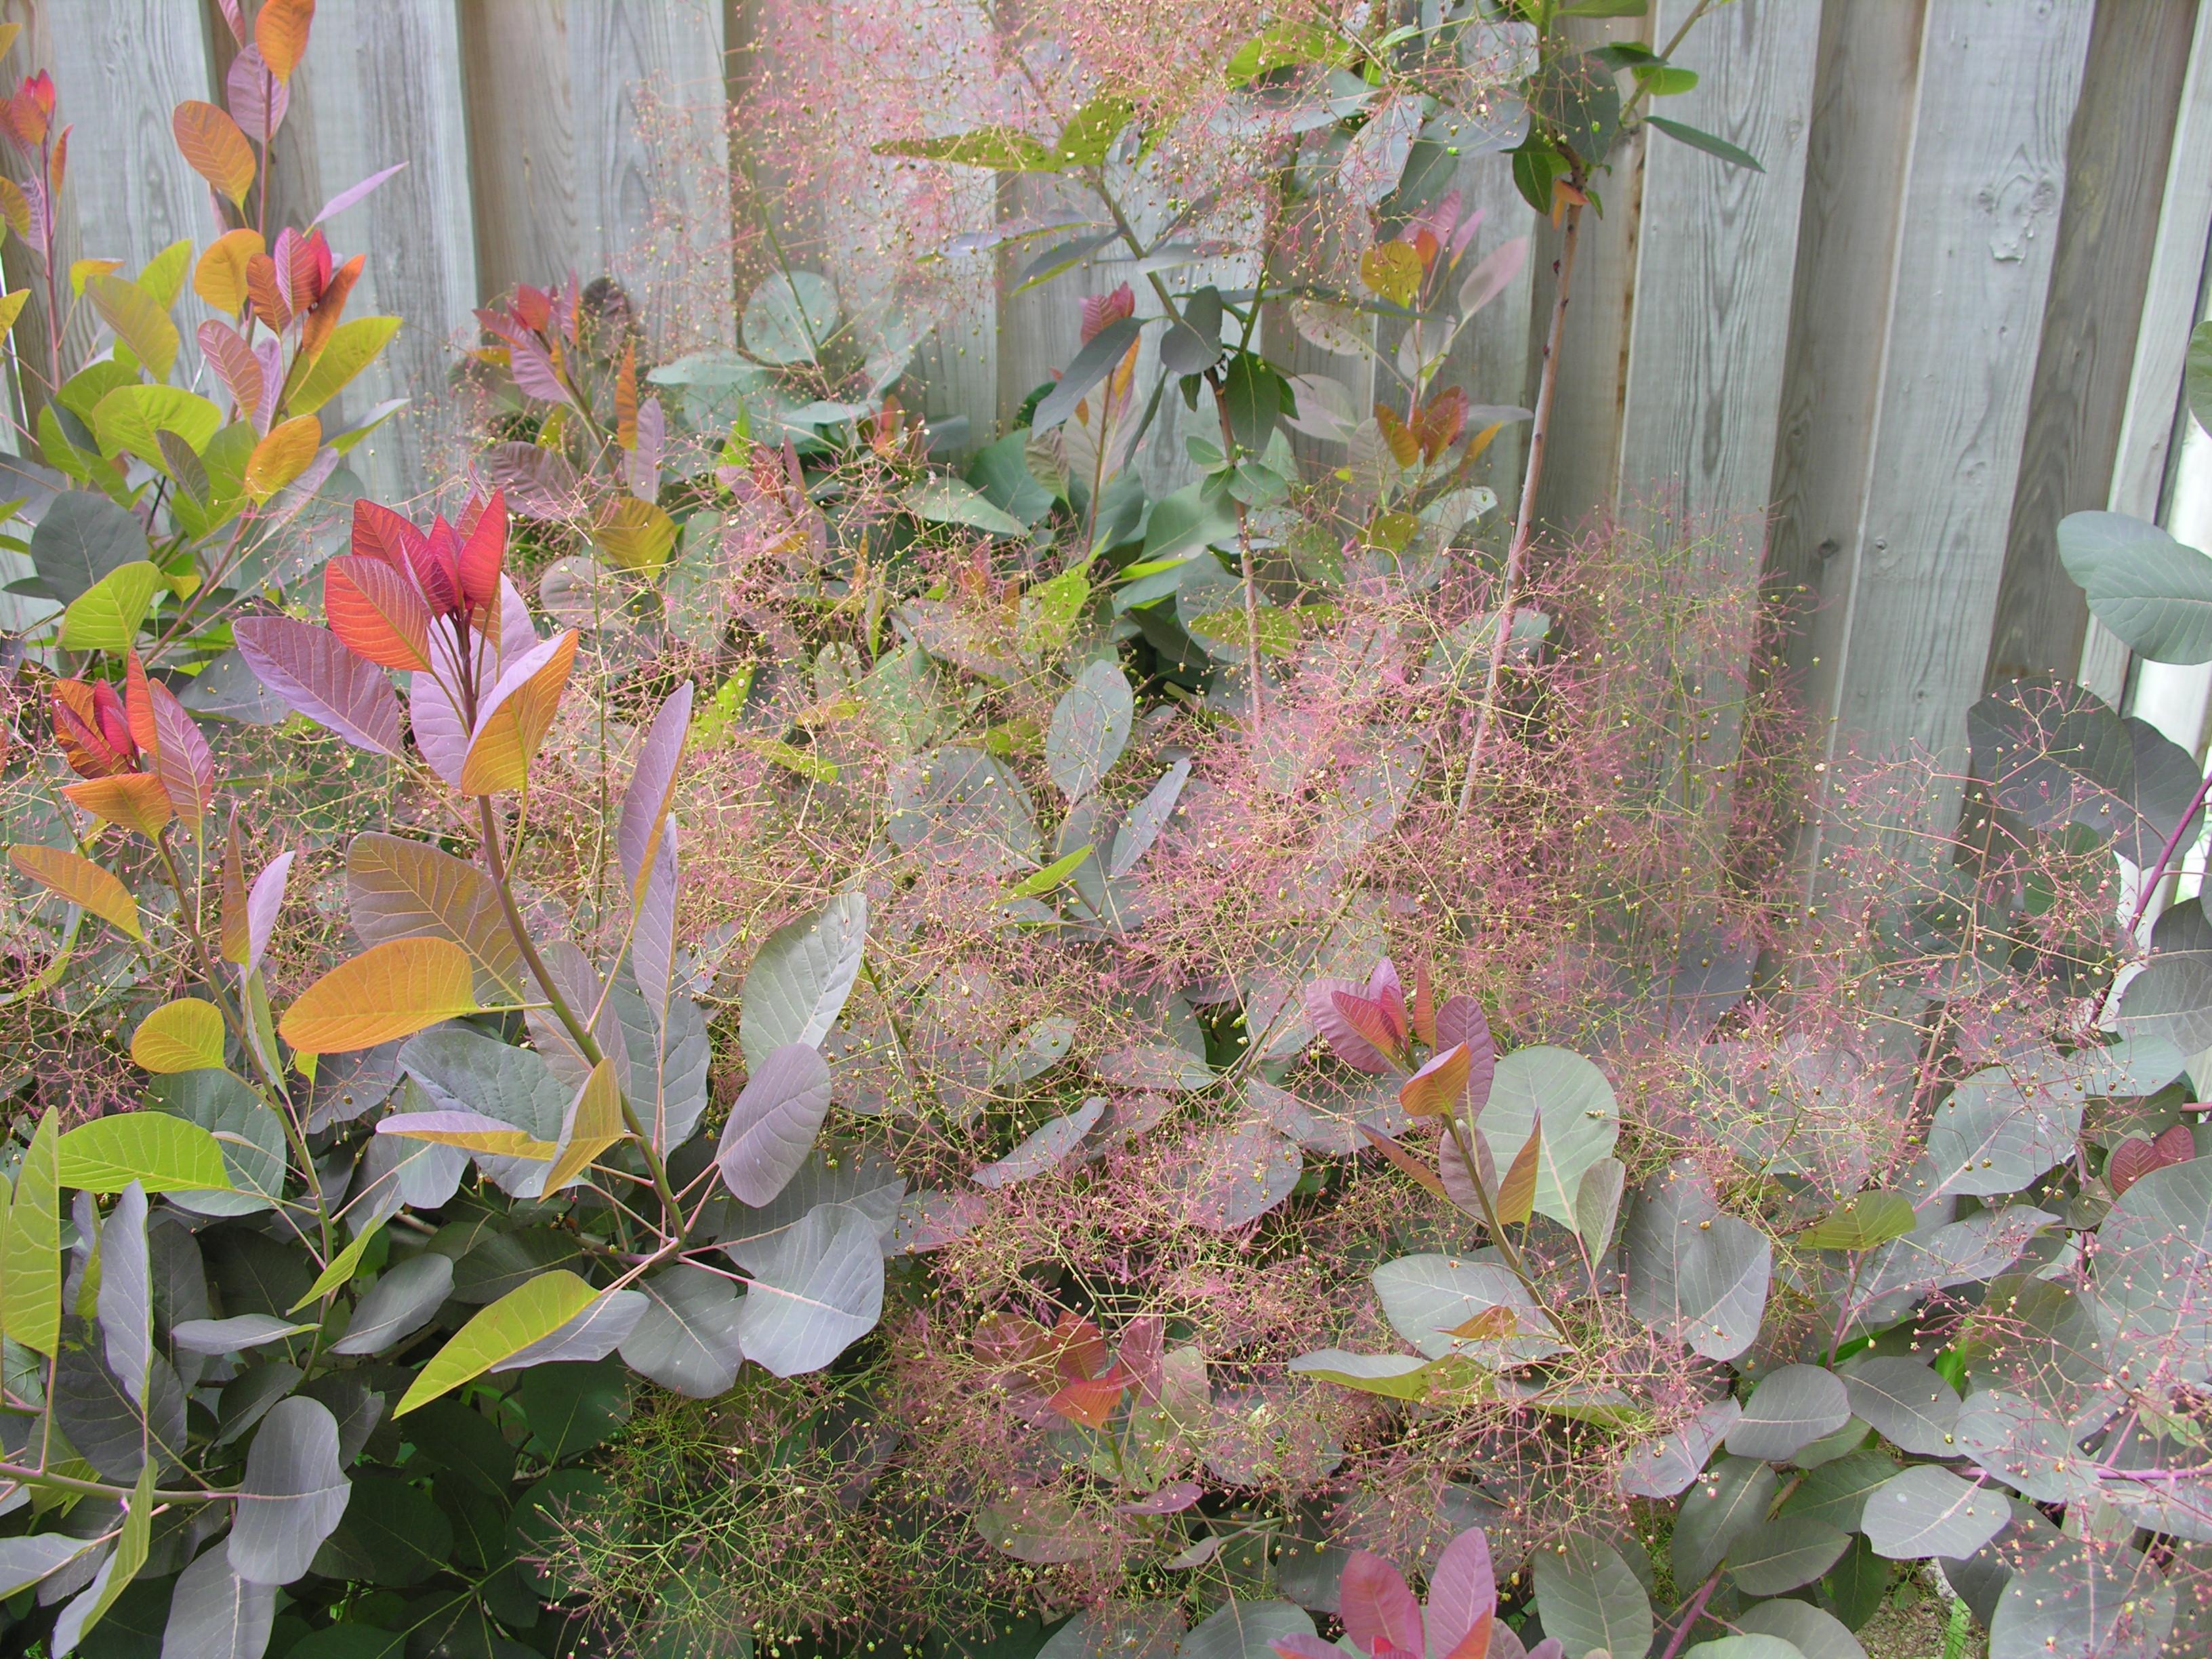 Cotinus Grace Smoke Bush Flower Panicles Beginning To Look Like